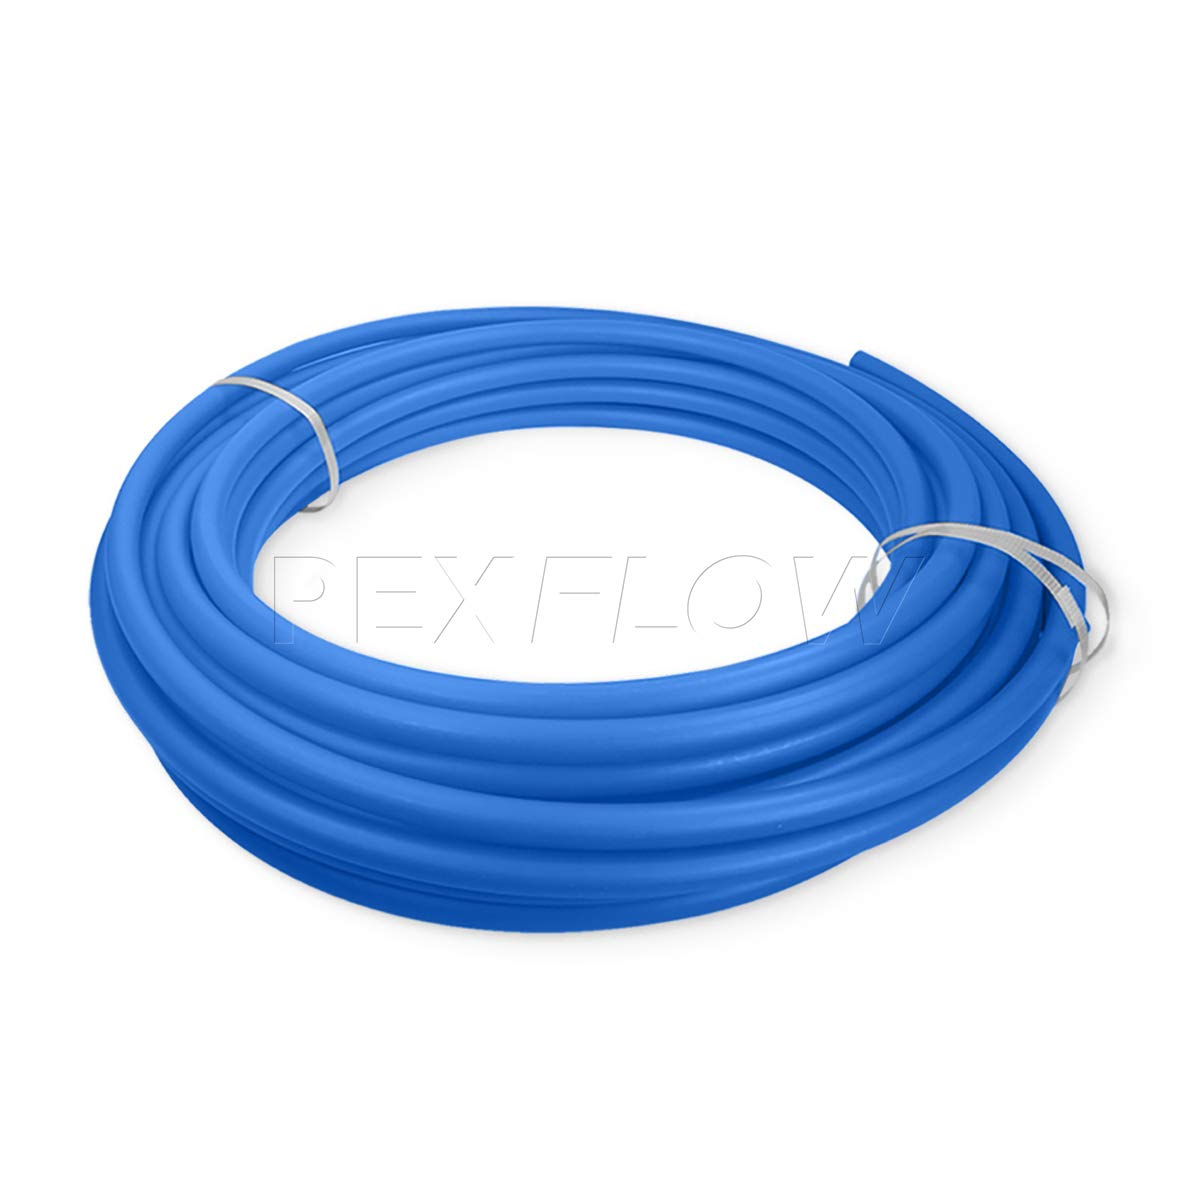 Pexflow PFW-B12300 Potable Water Pex tubing, 300 Feet, Blue by PEXFLOW